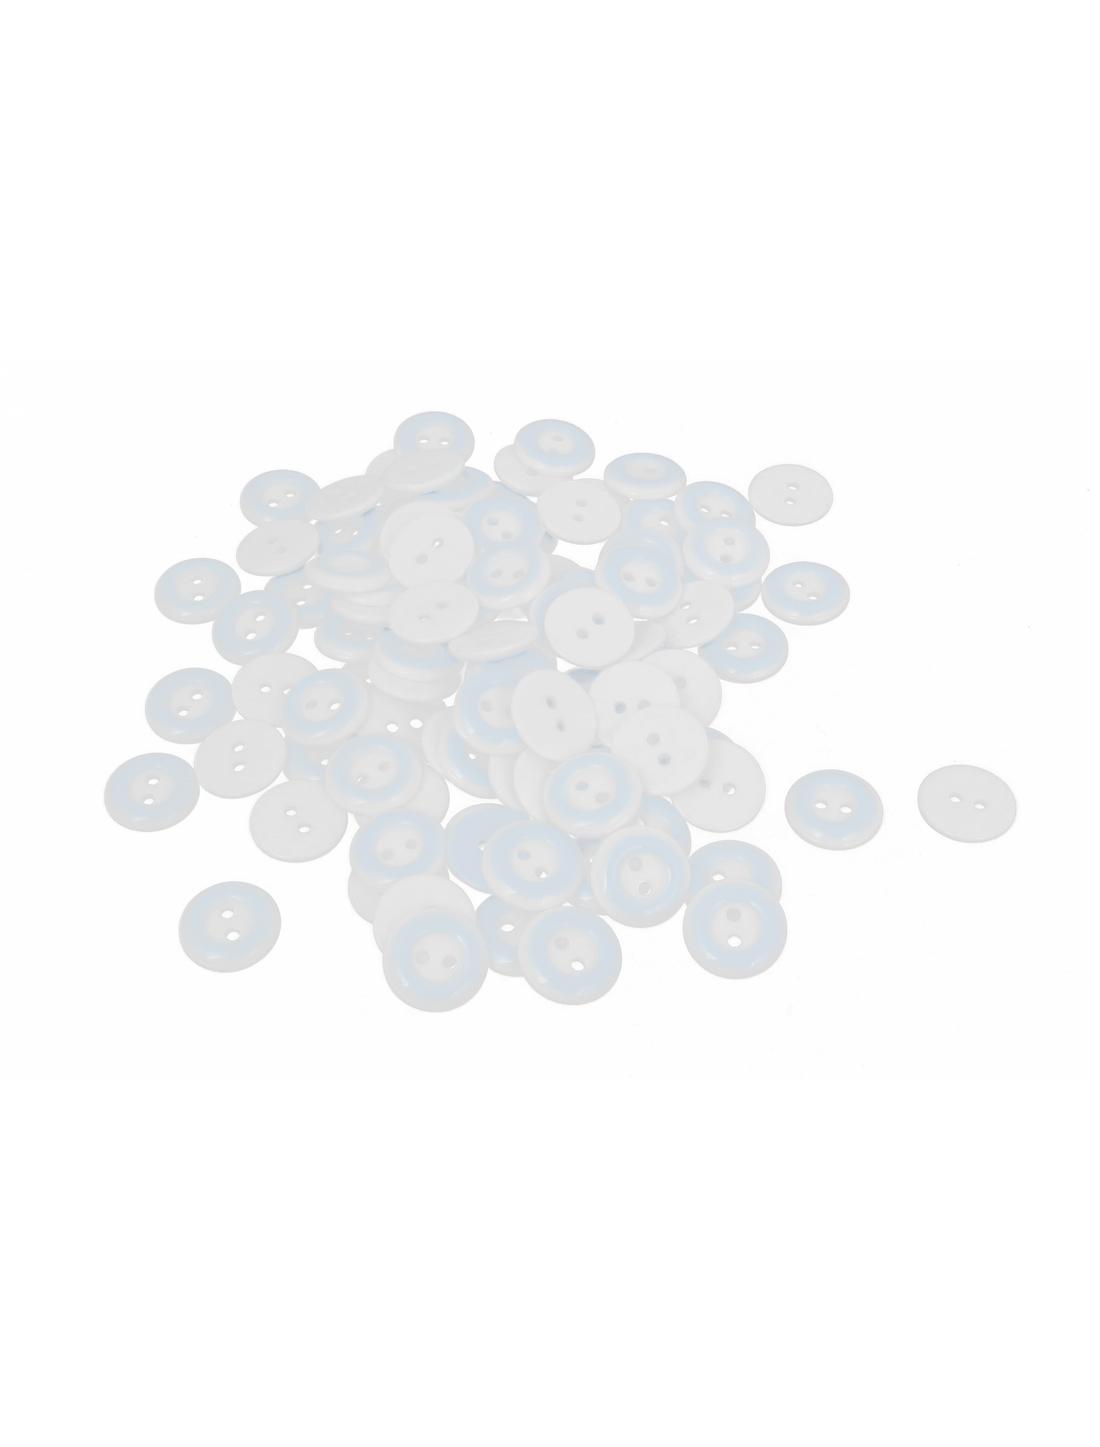 13mm Dia Plastic Round 2-Hole Babe Clothing Clothes Button Blue White 100pcs